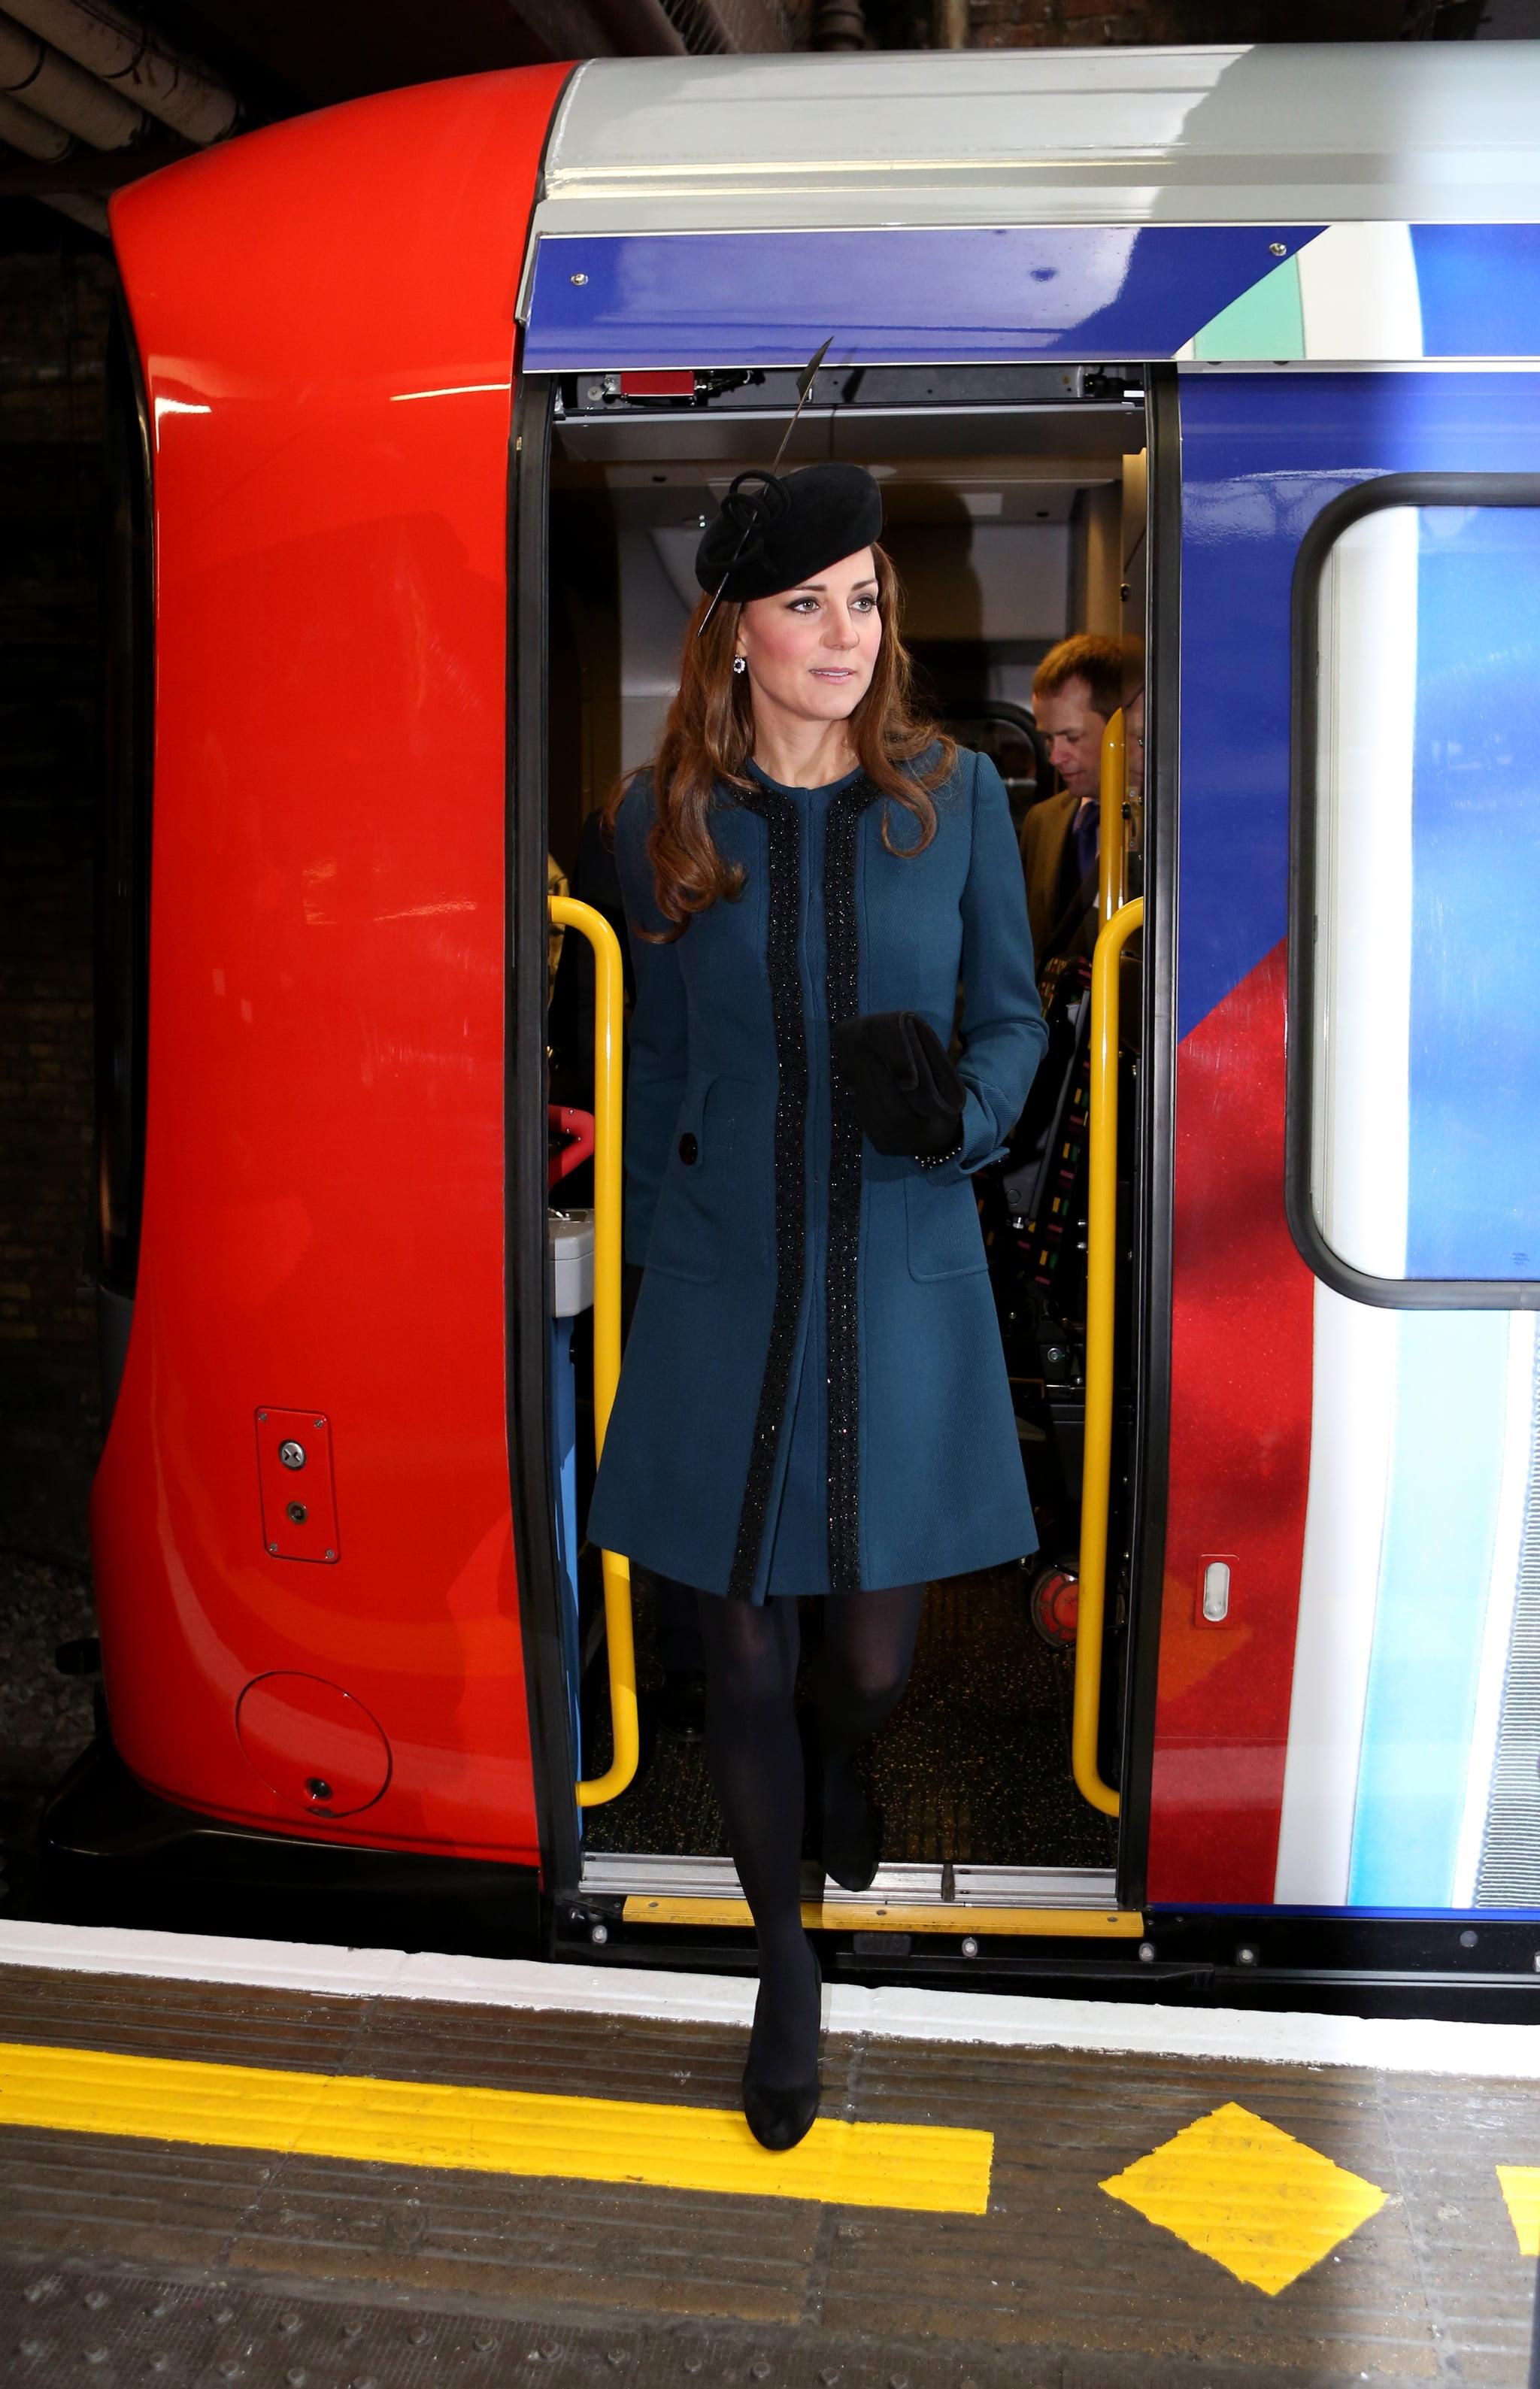 Kate Middleton at the Baker Street Underground Station in 2013